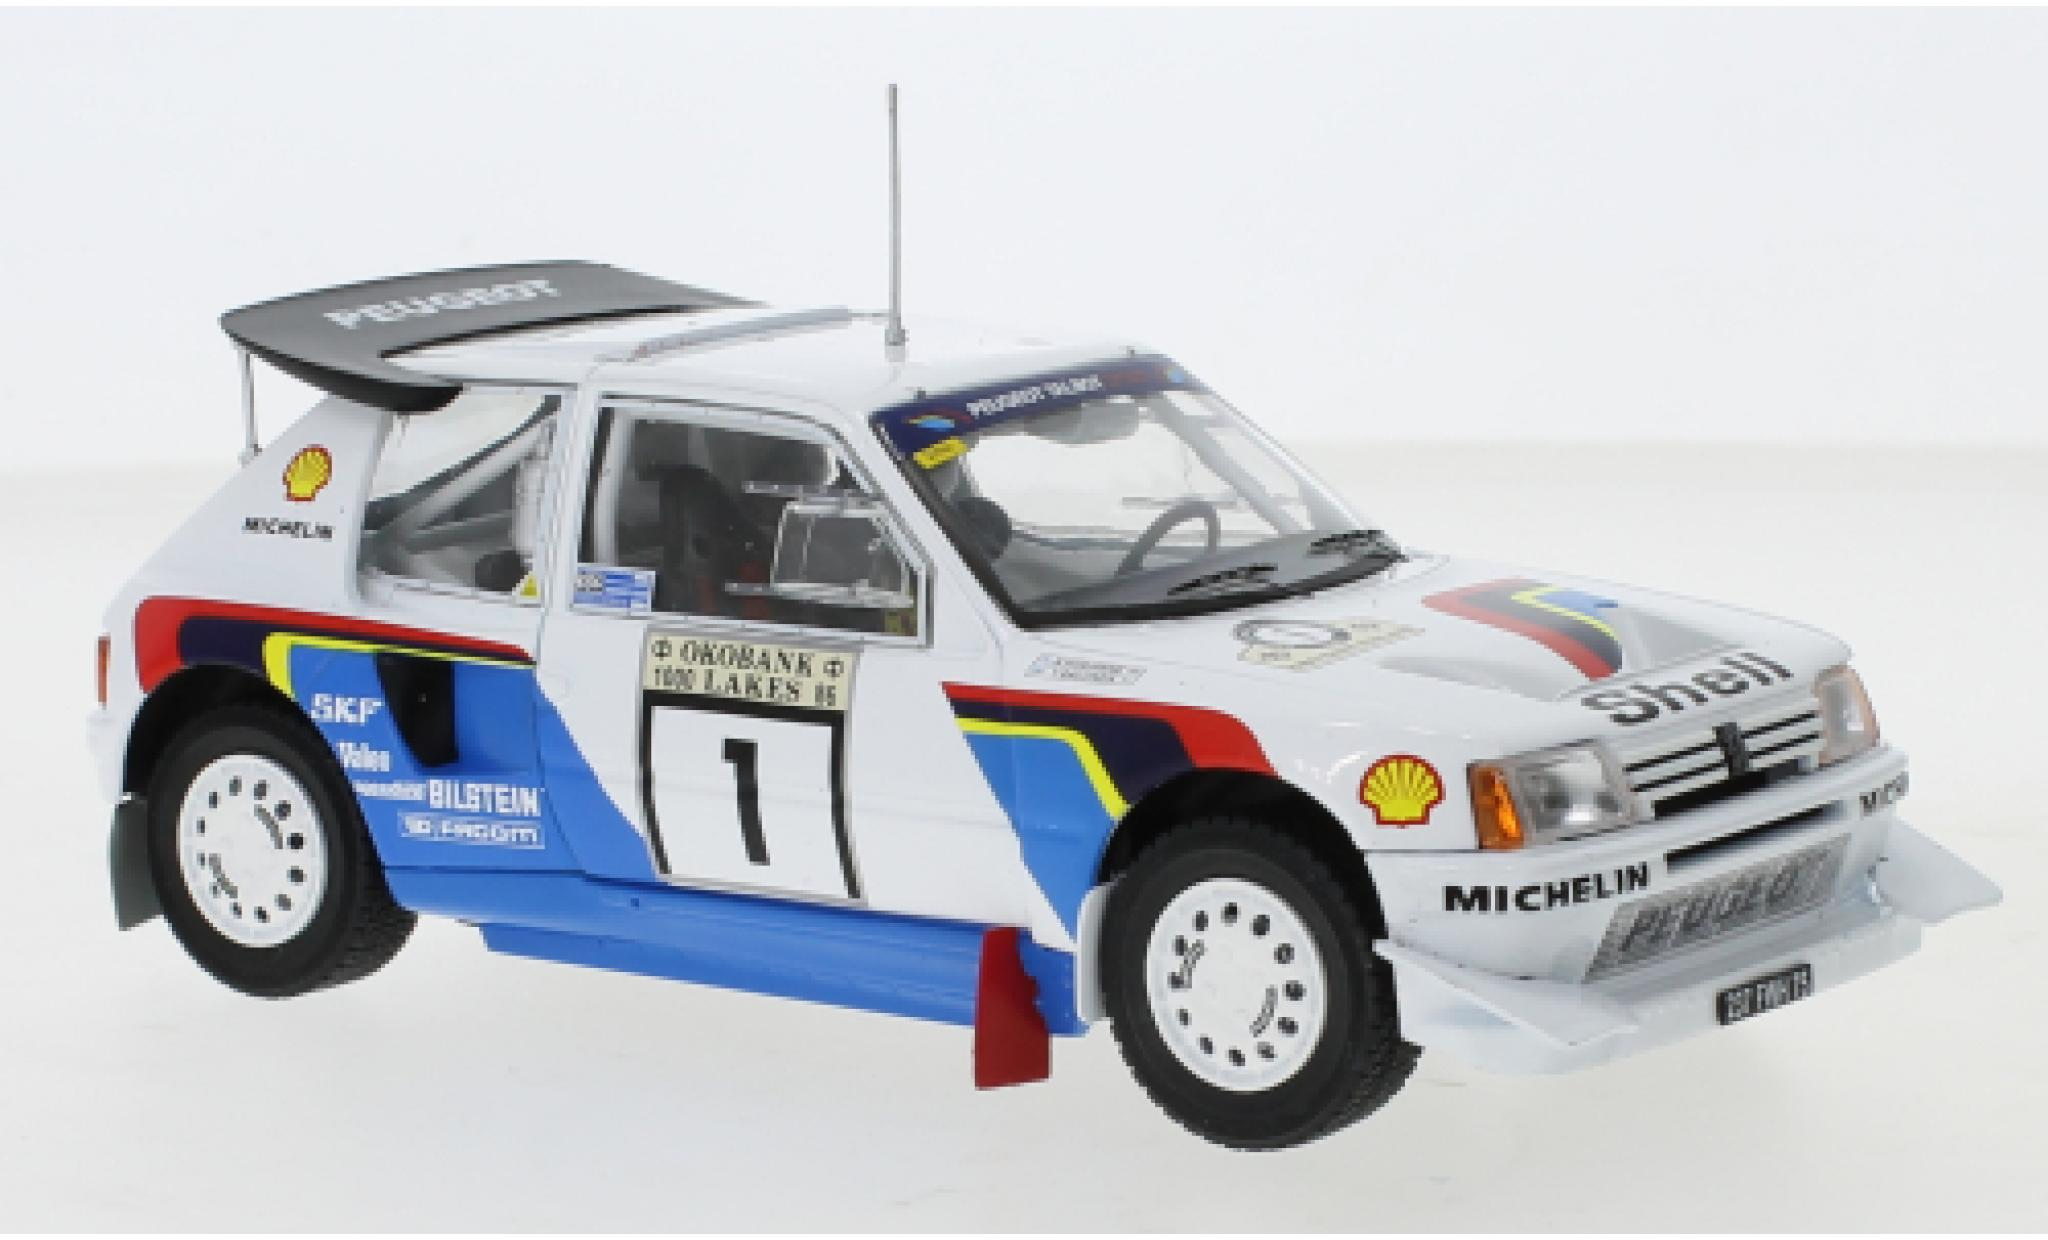 Peugeot 205 1/24 IXO T16 E2 No.1 Rallye WM 1000 Lakes Rally 1986 T.Salonen/S.Harjanne